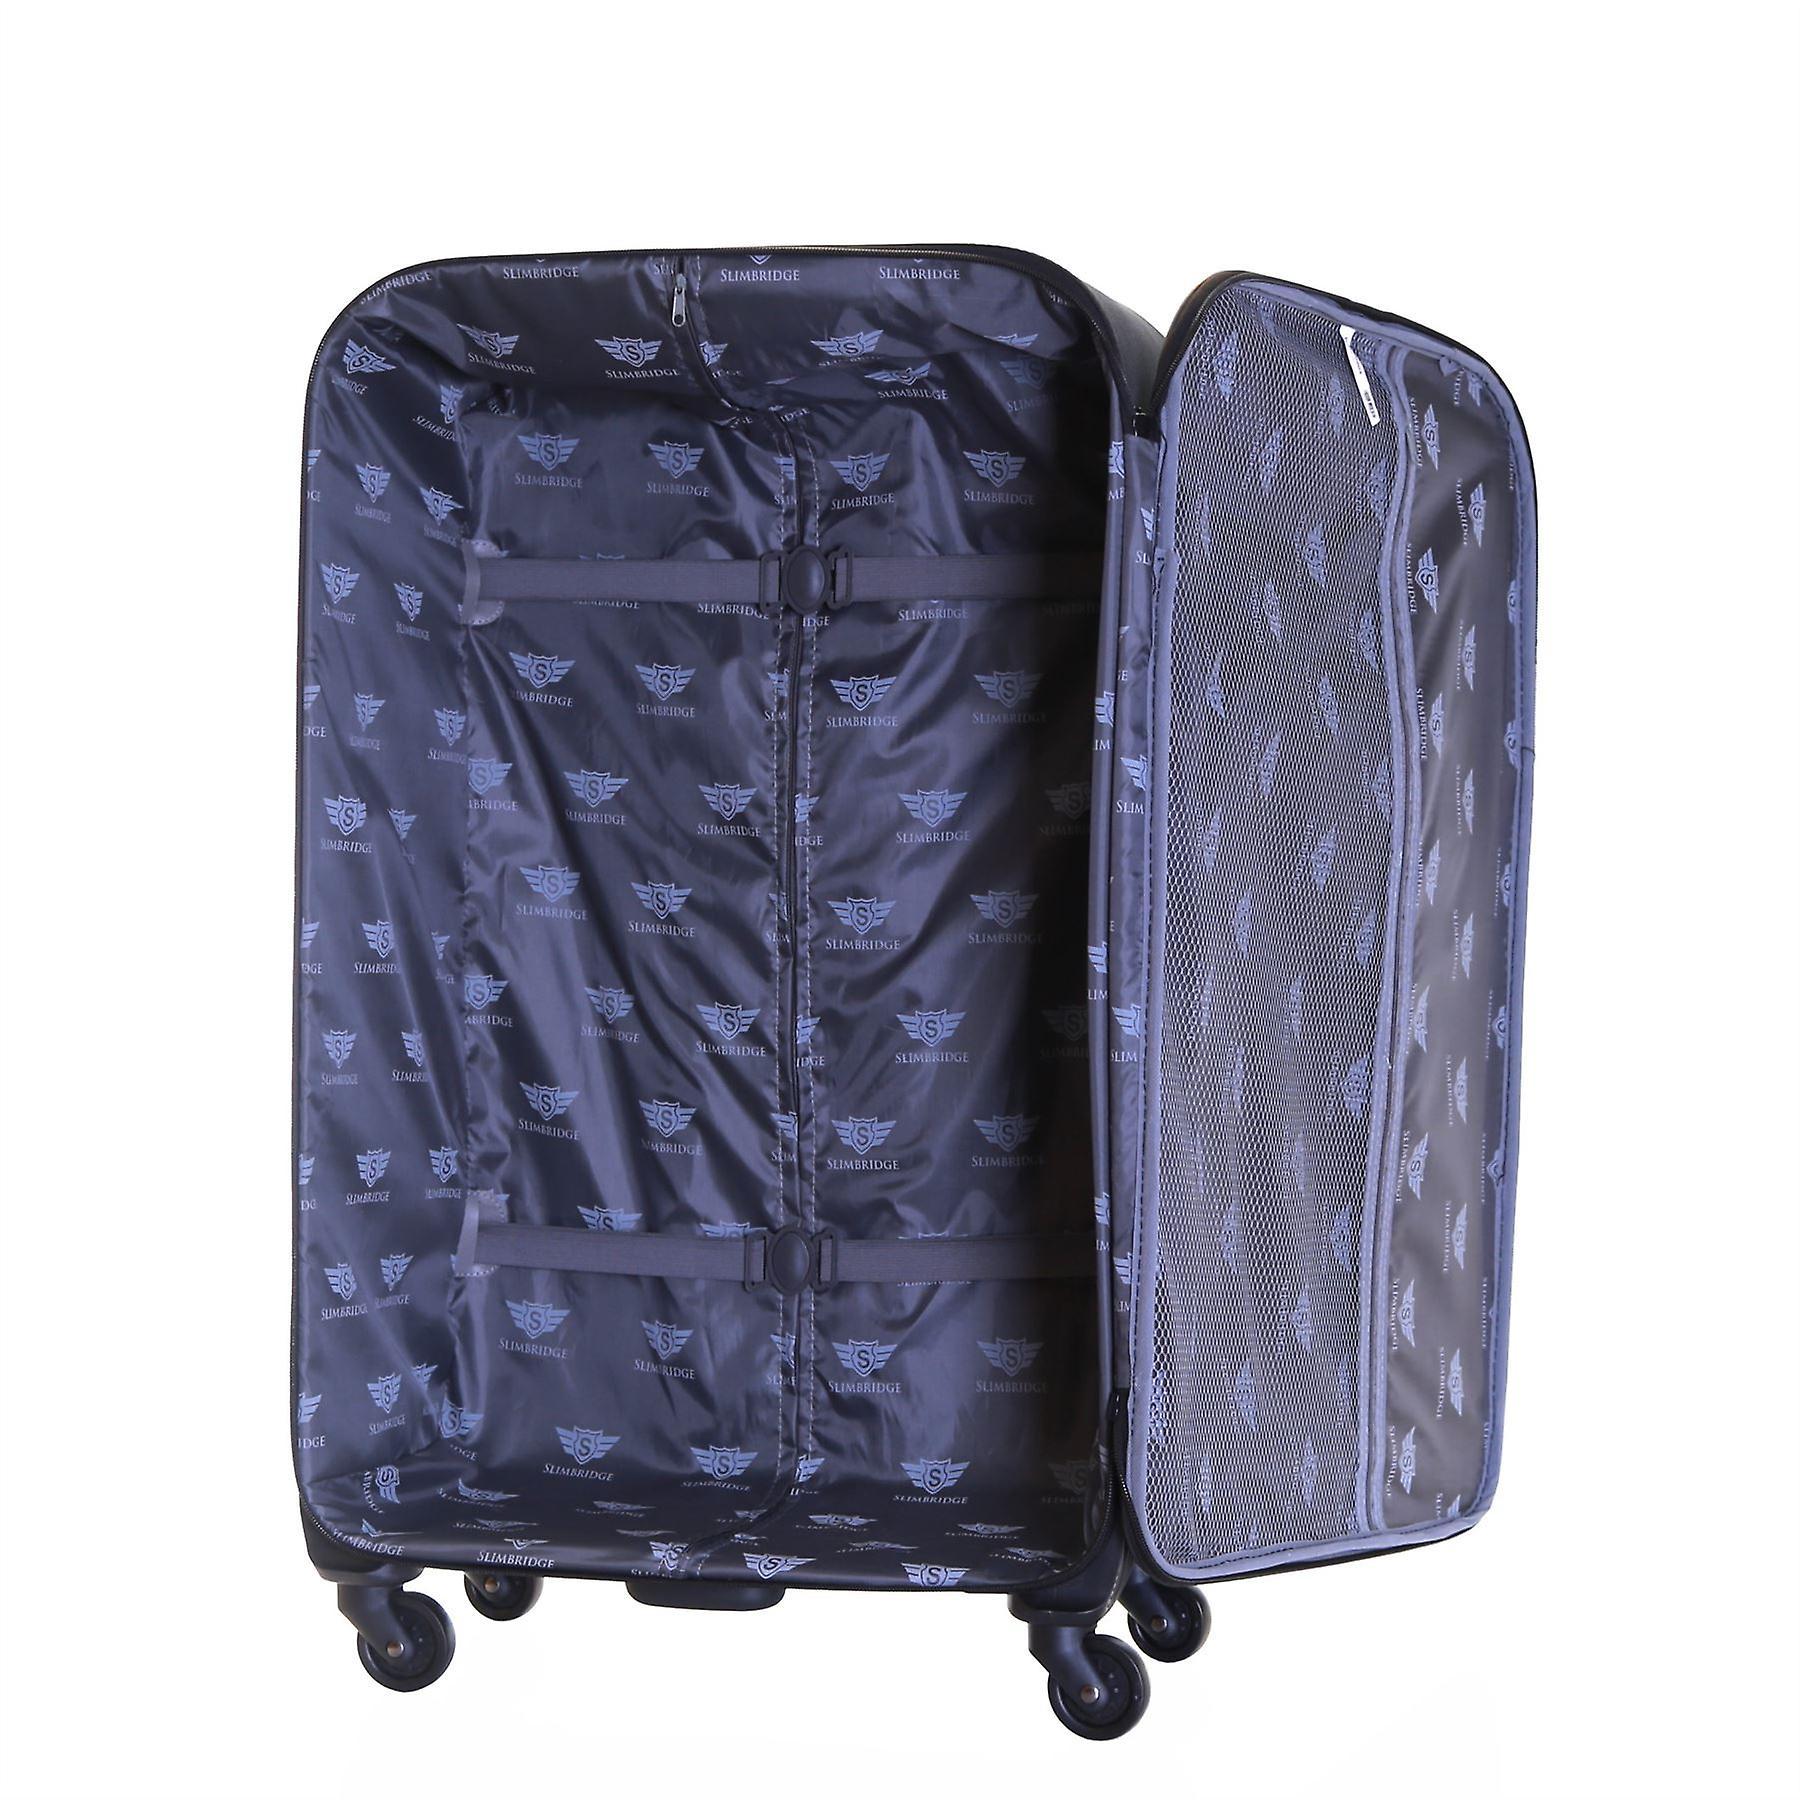 Slimbridge Andalucia 79 cm Spinner Suitcase, Black